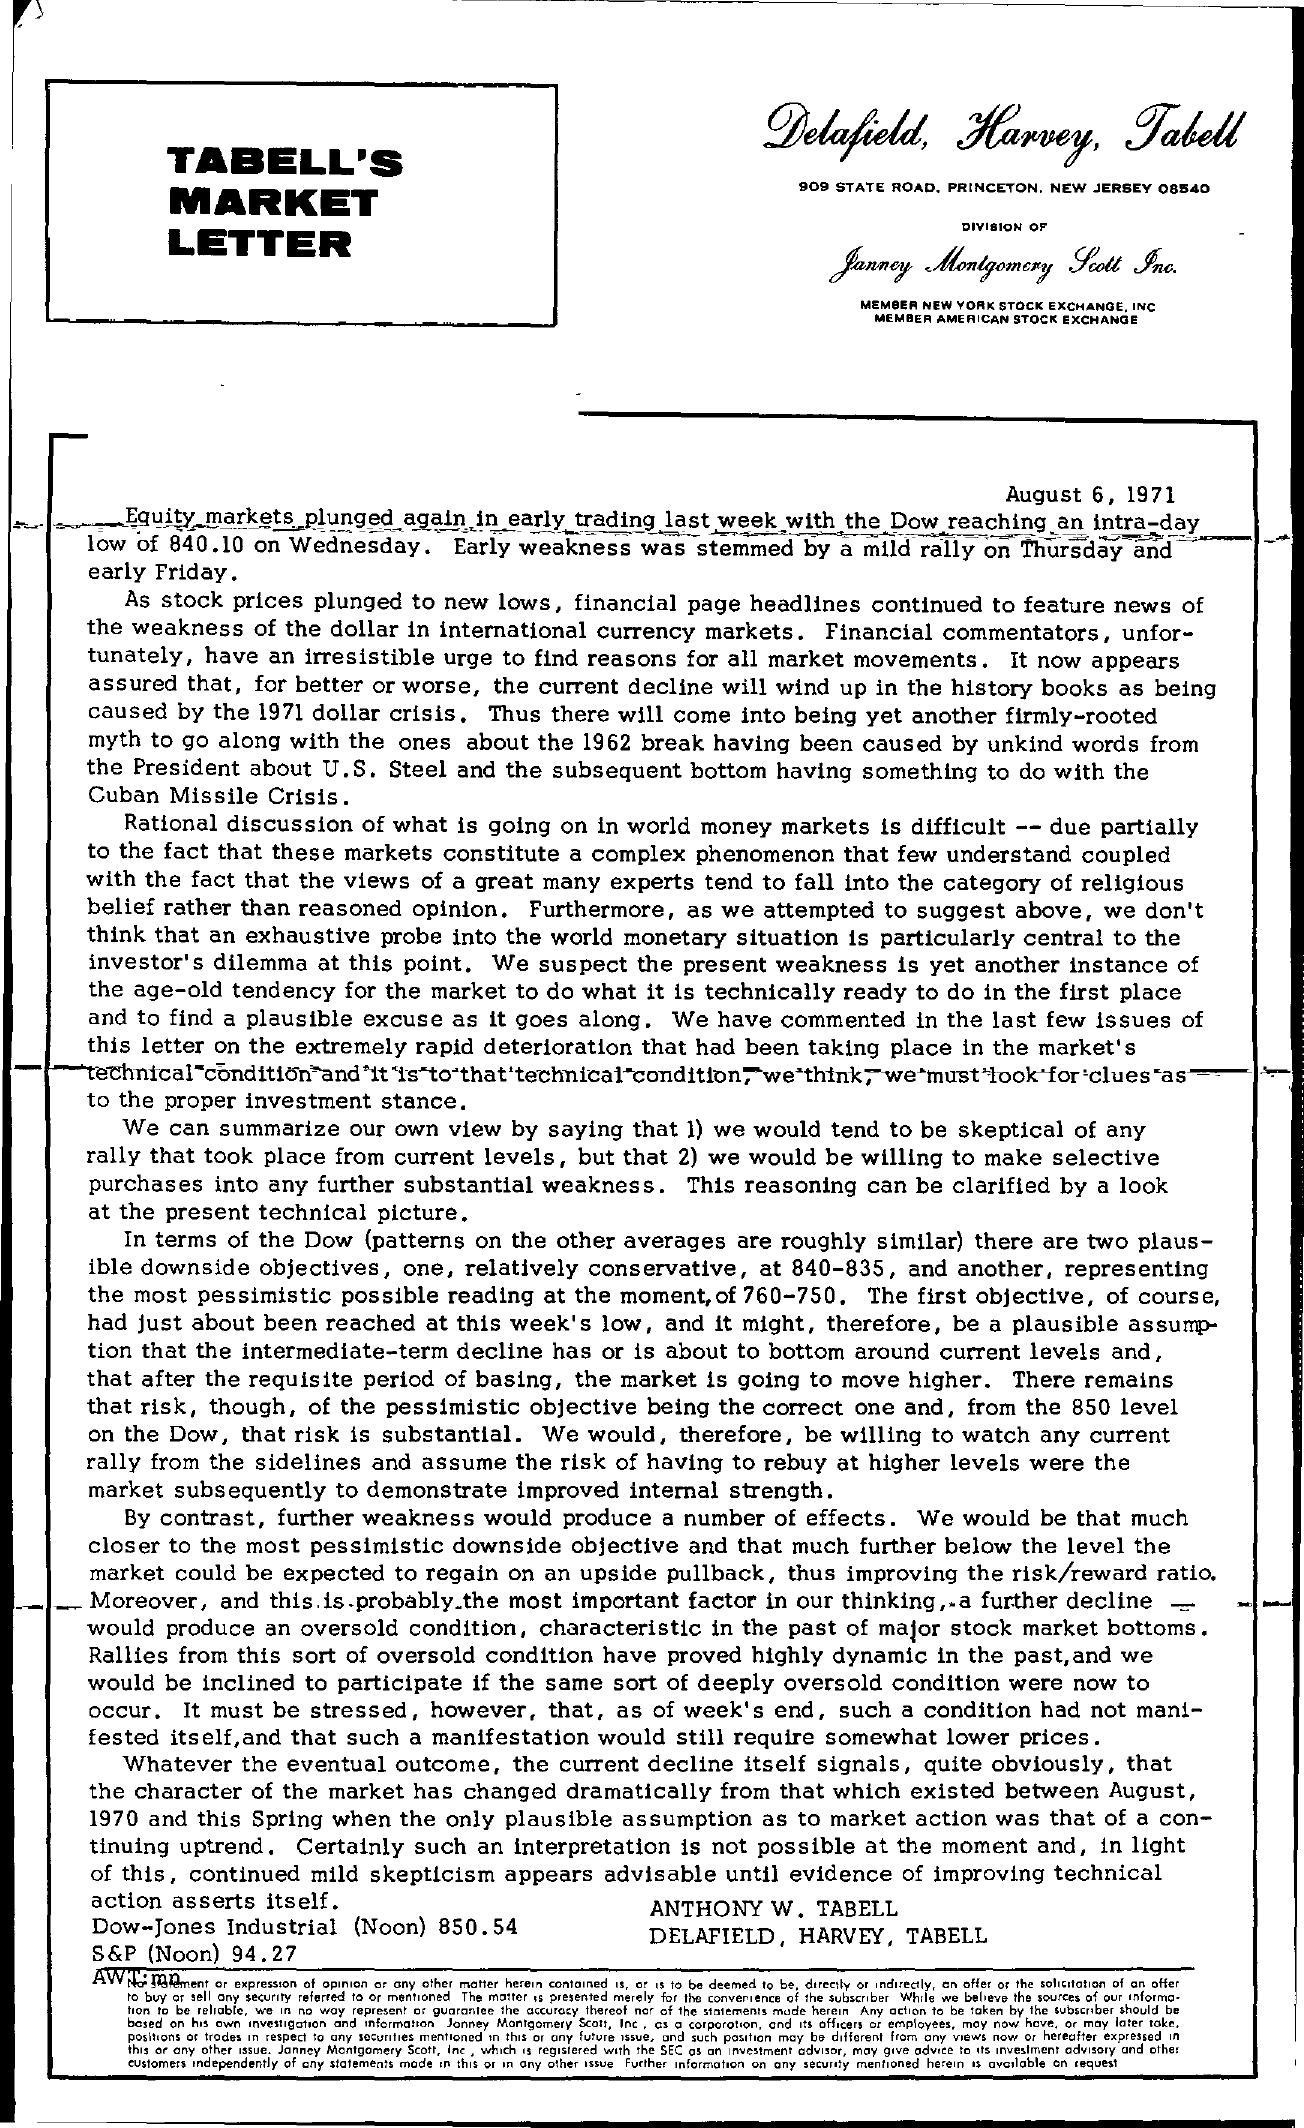 Tabell's Market Letter - August 06, 1971